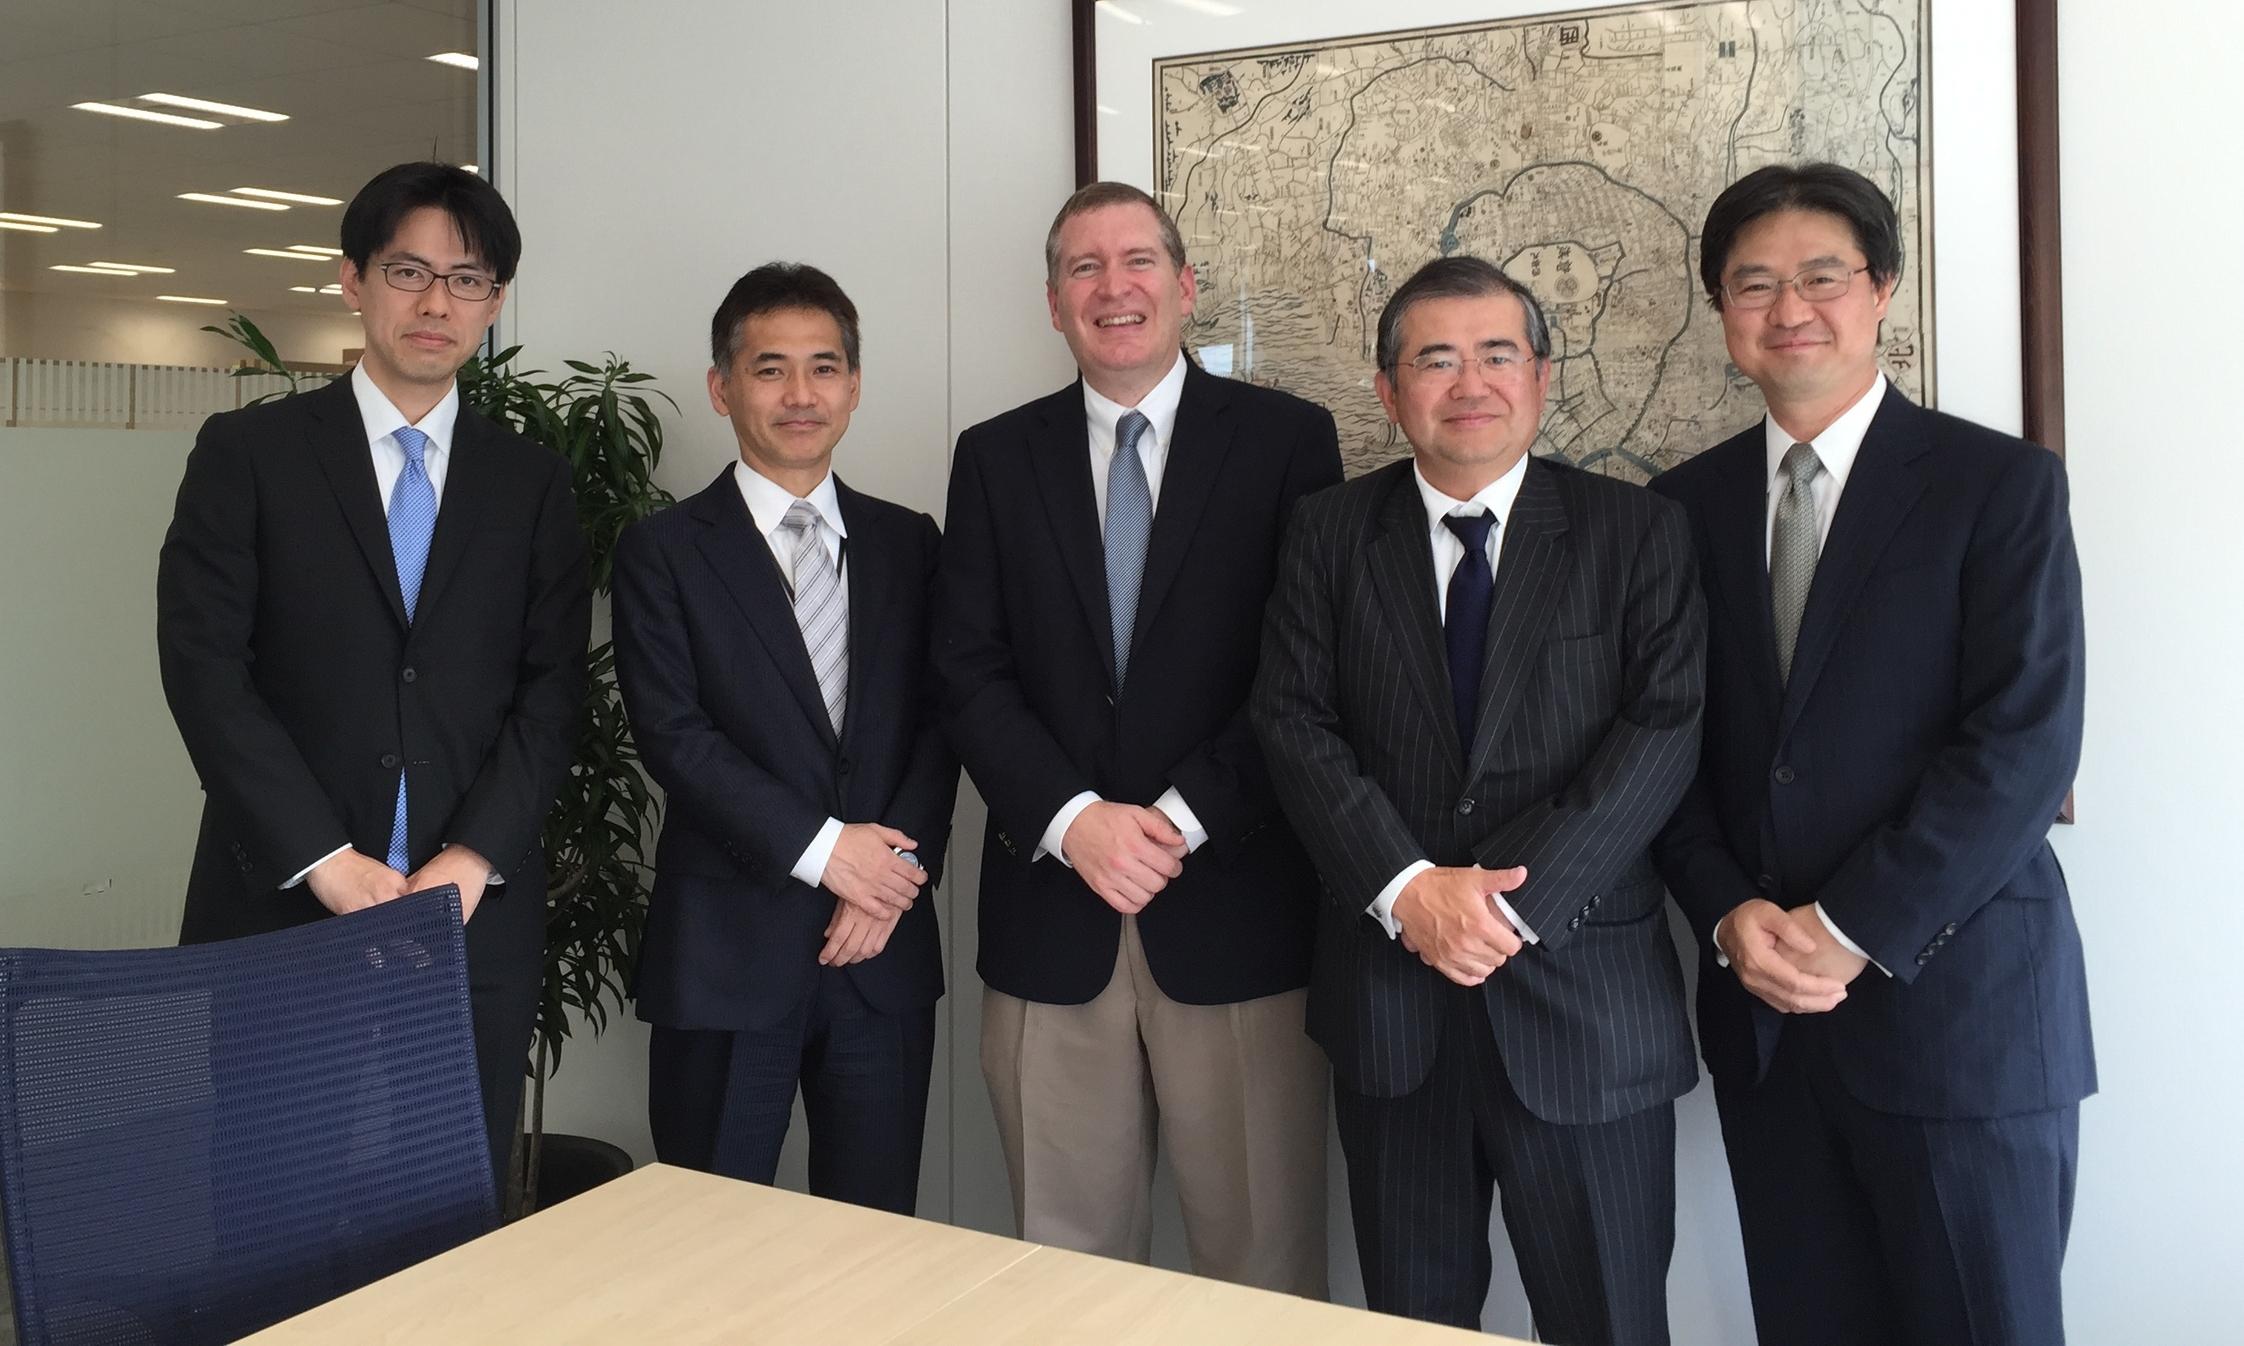 John Lunt with Masaki Sugihara, Hisashi Takahashi, Naoki Kawachi, and Masatoshi Tobita of State Street Global Advisors